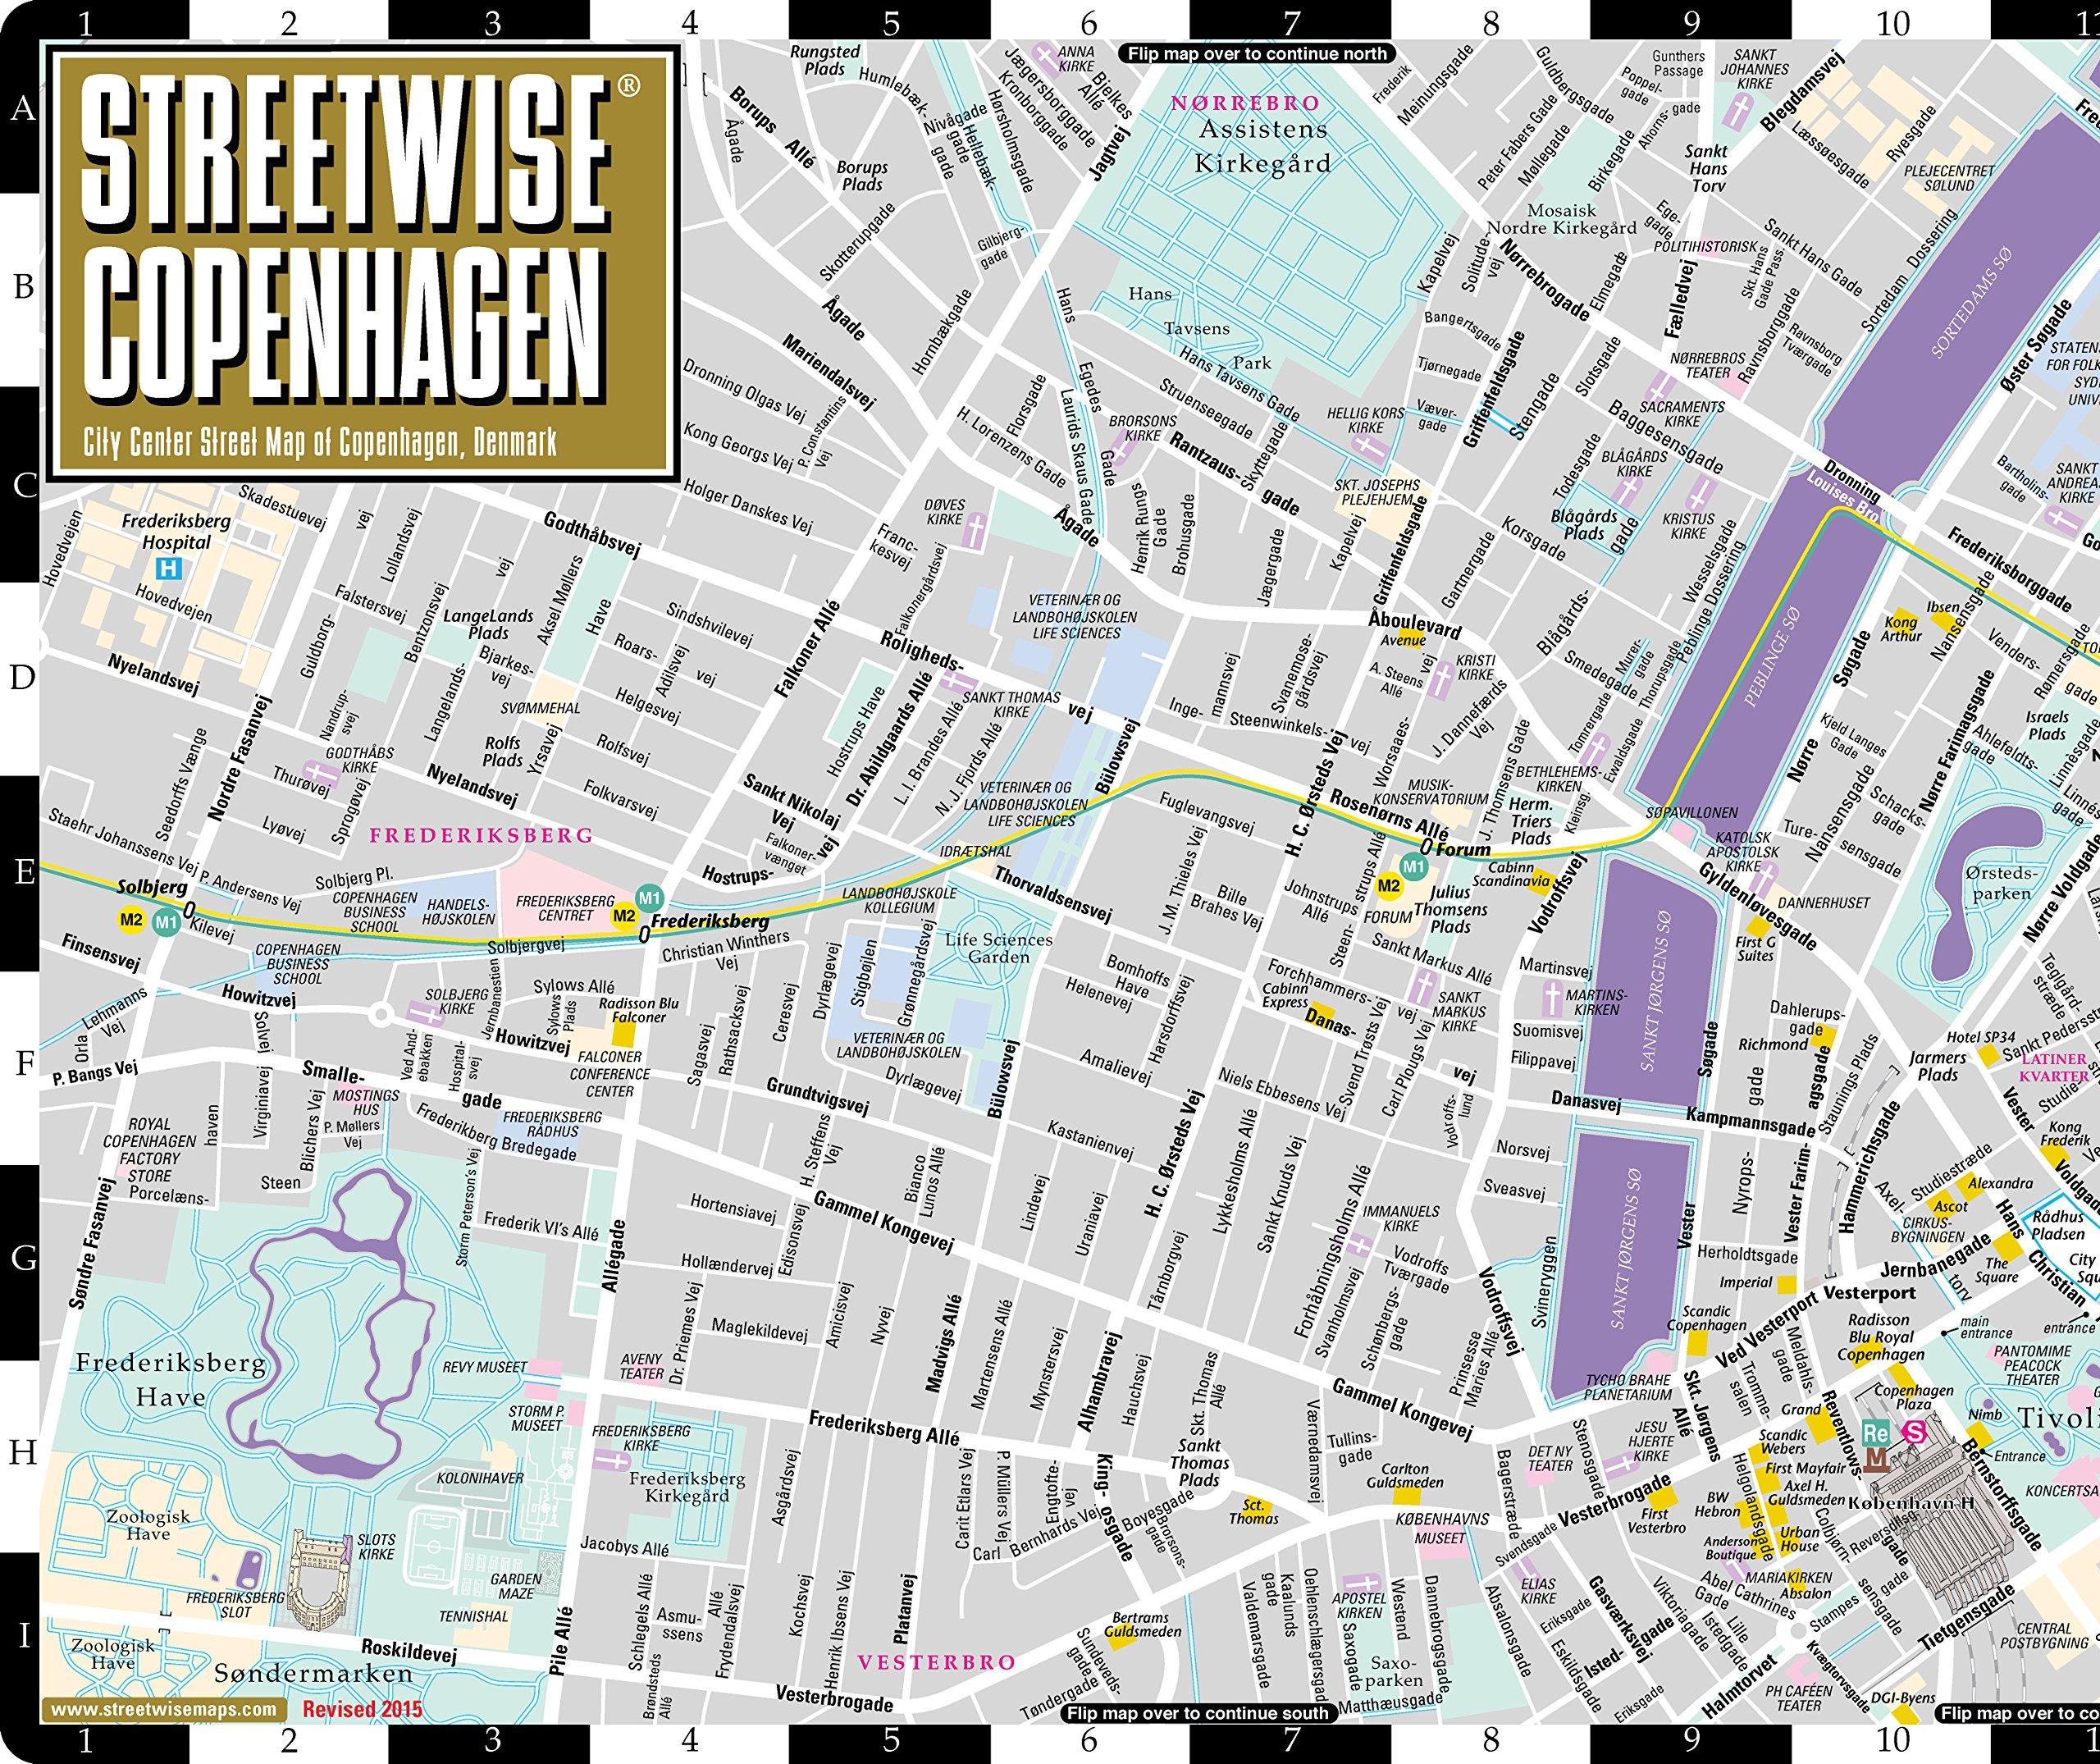 Streetwise Copenhagen Map City Center Street Map of Copenhagen